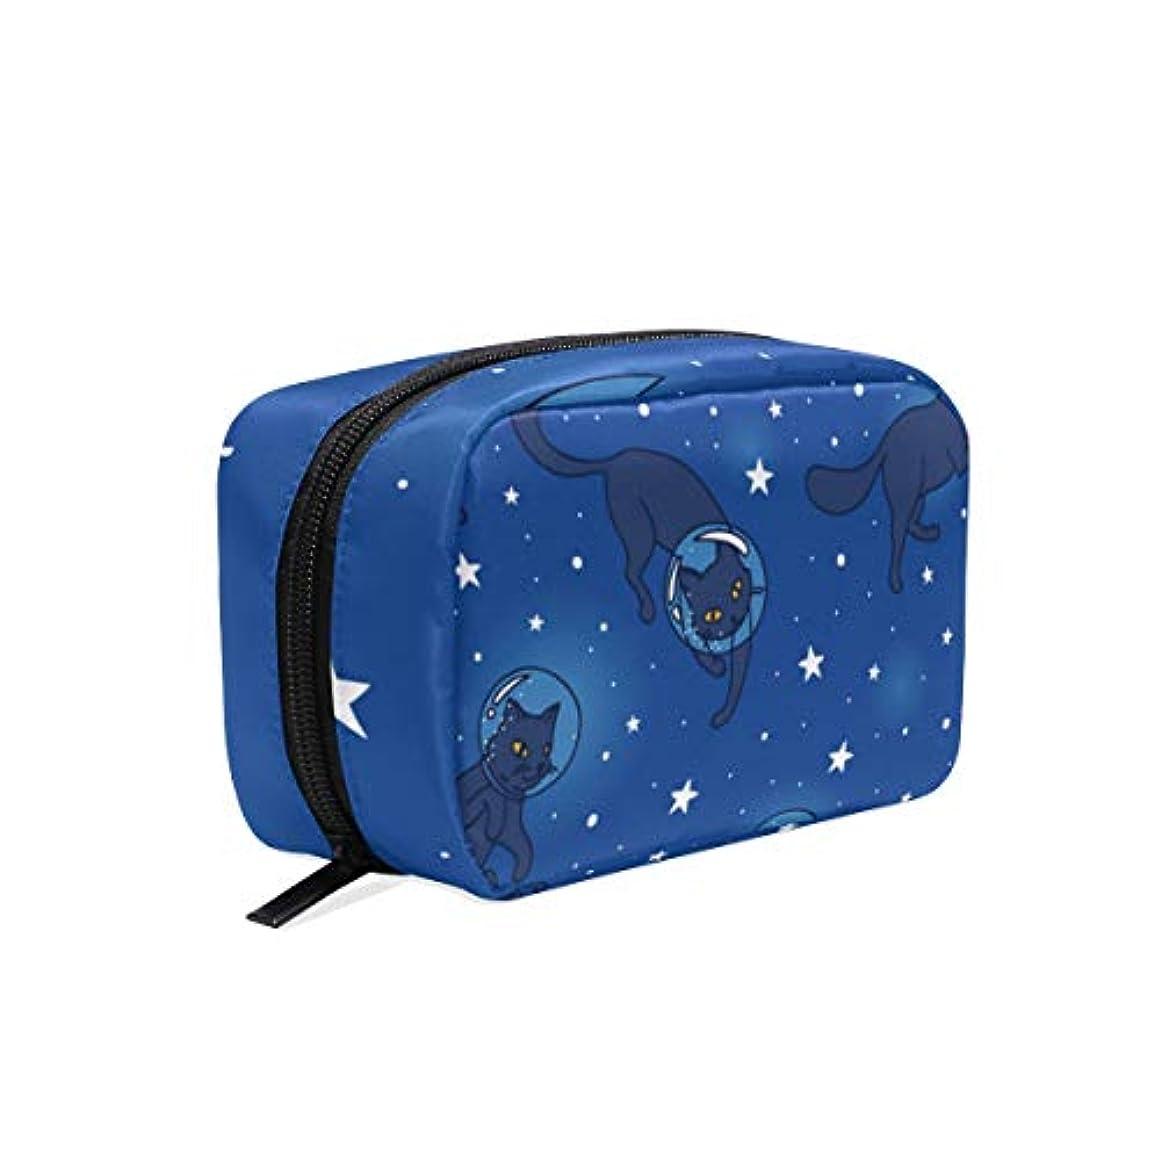 (VAWA) 化粧ポーチ 大容量 可愛い 宇宙 猫柄 星柄 メイクポーチ コンパクト 機能的 おしゃれ 持ち運び コスメ収納 仕切り ミニポーチ バニティーケース 洗面道具 携帯用